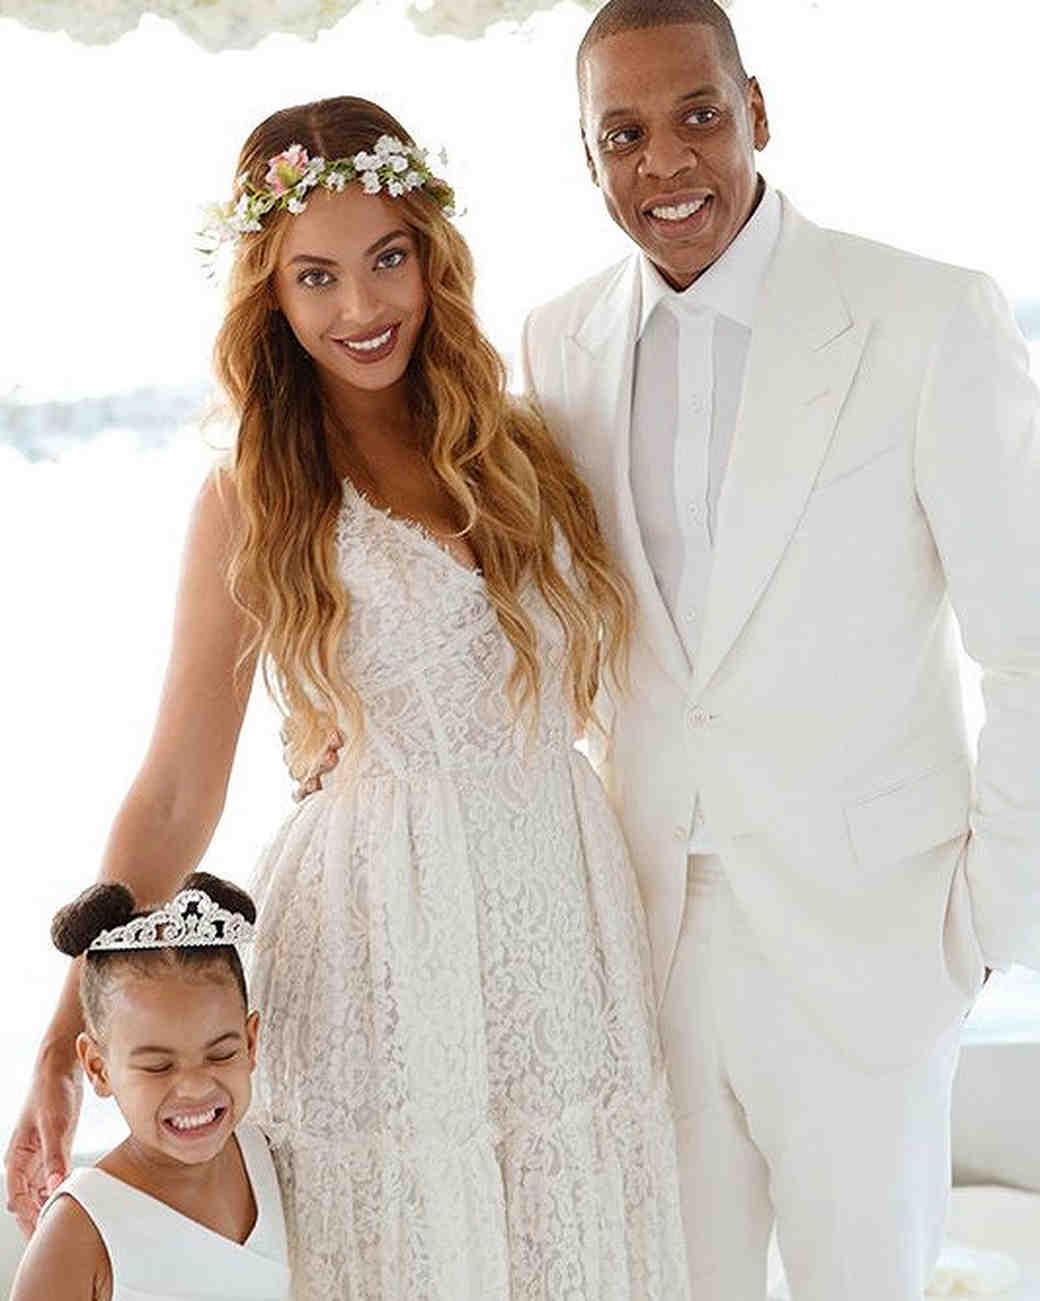 blue-ivy-carter-beyonce-jay-z-celebrity-kids-weddings-0716.jpg